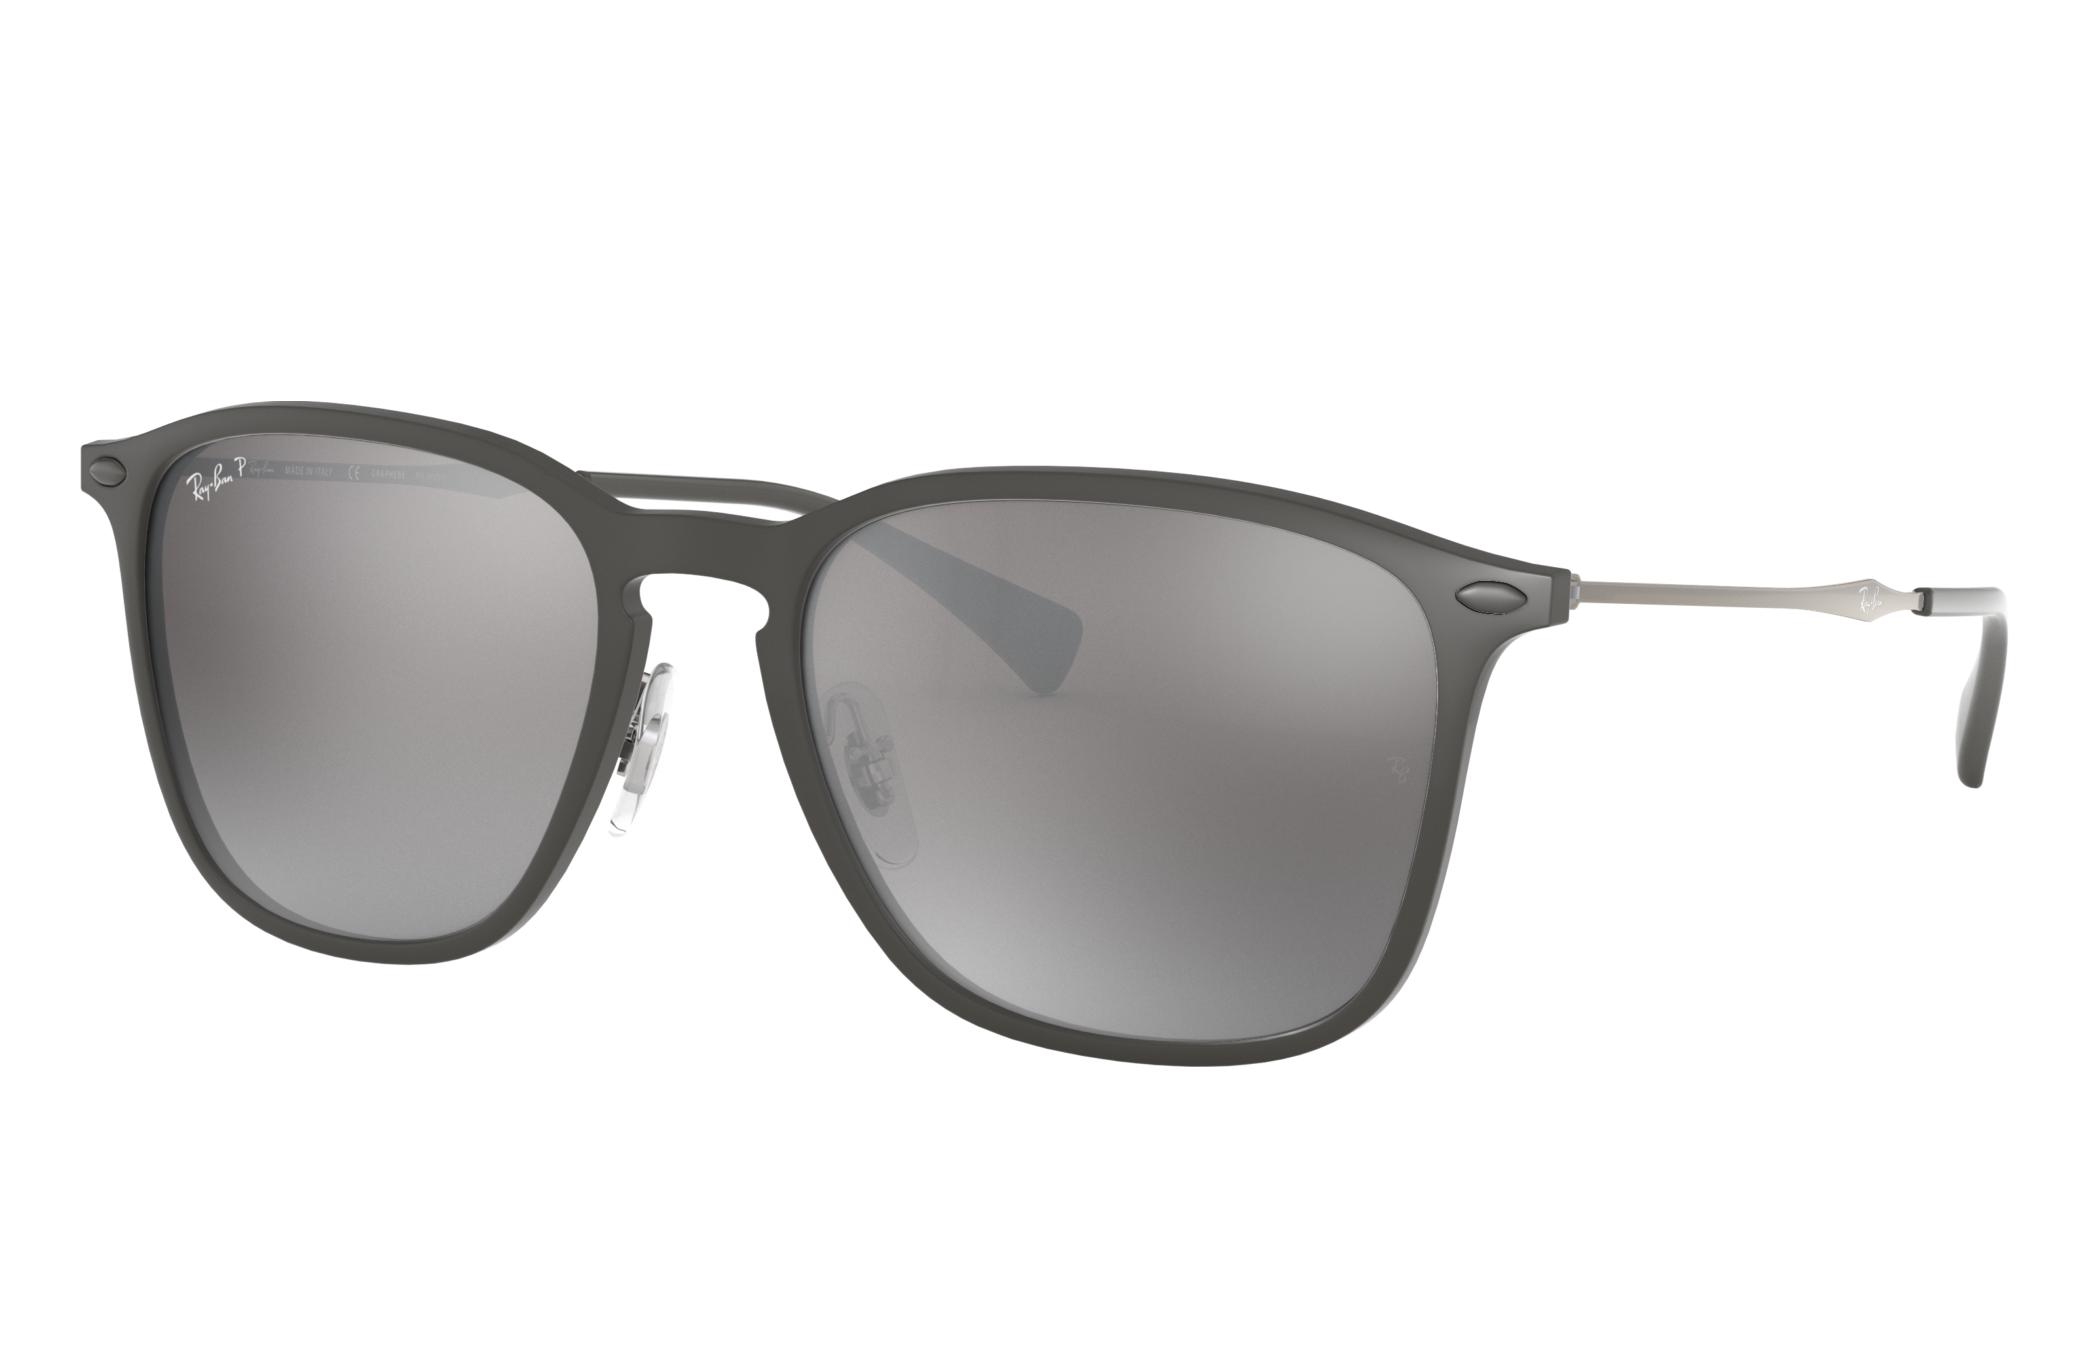 Ray-Ban Rb8353 Gunmetal, Polarized Gray Lenses - RB8353